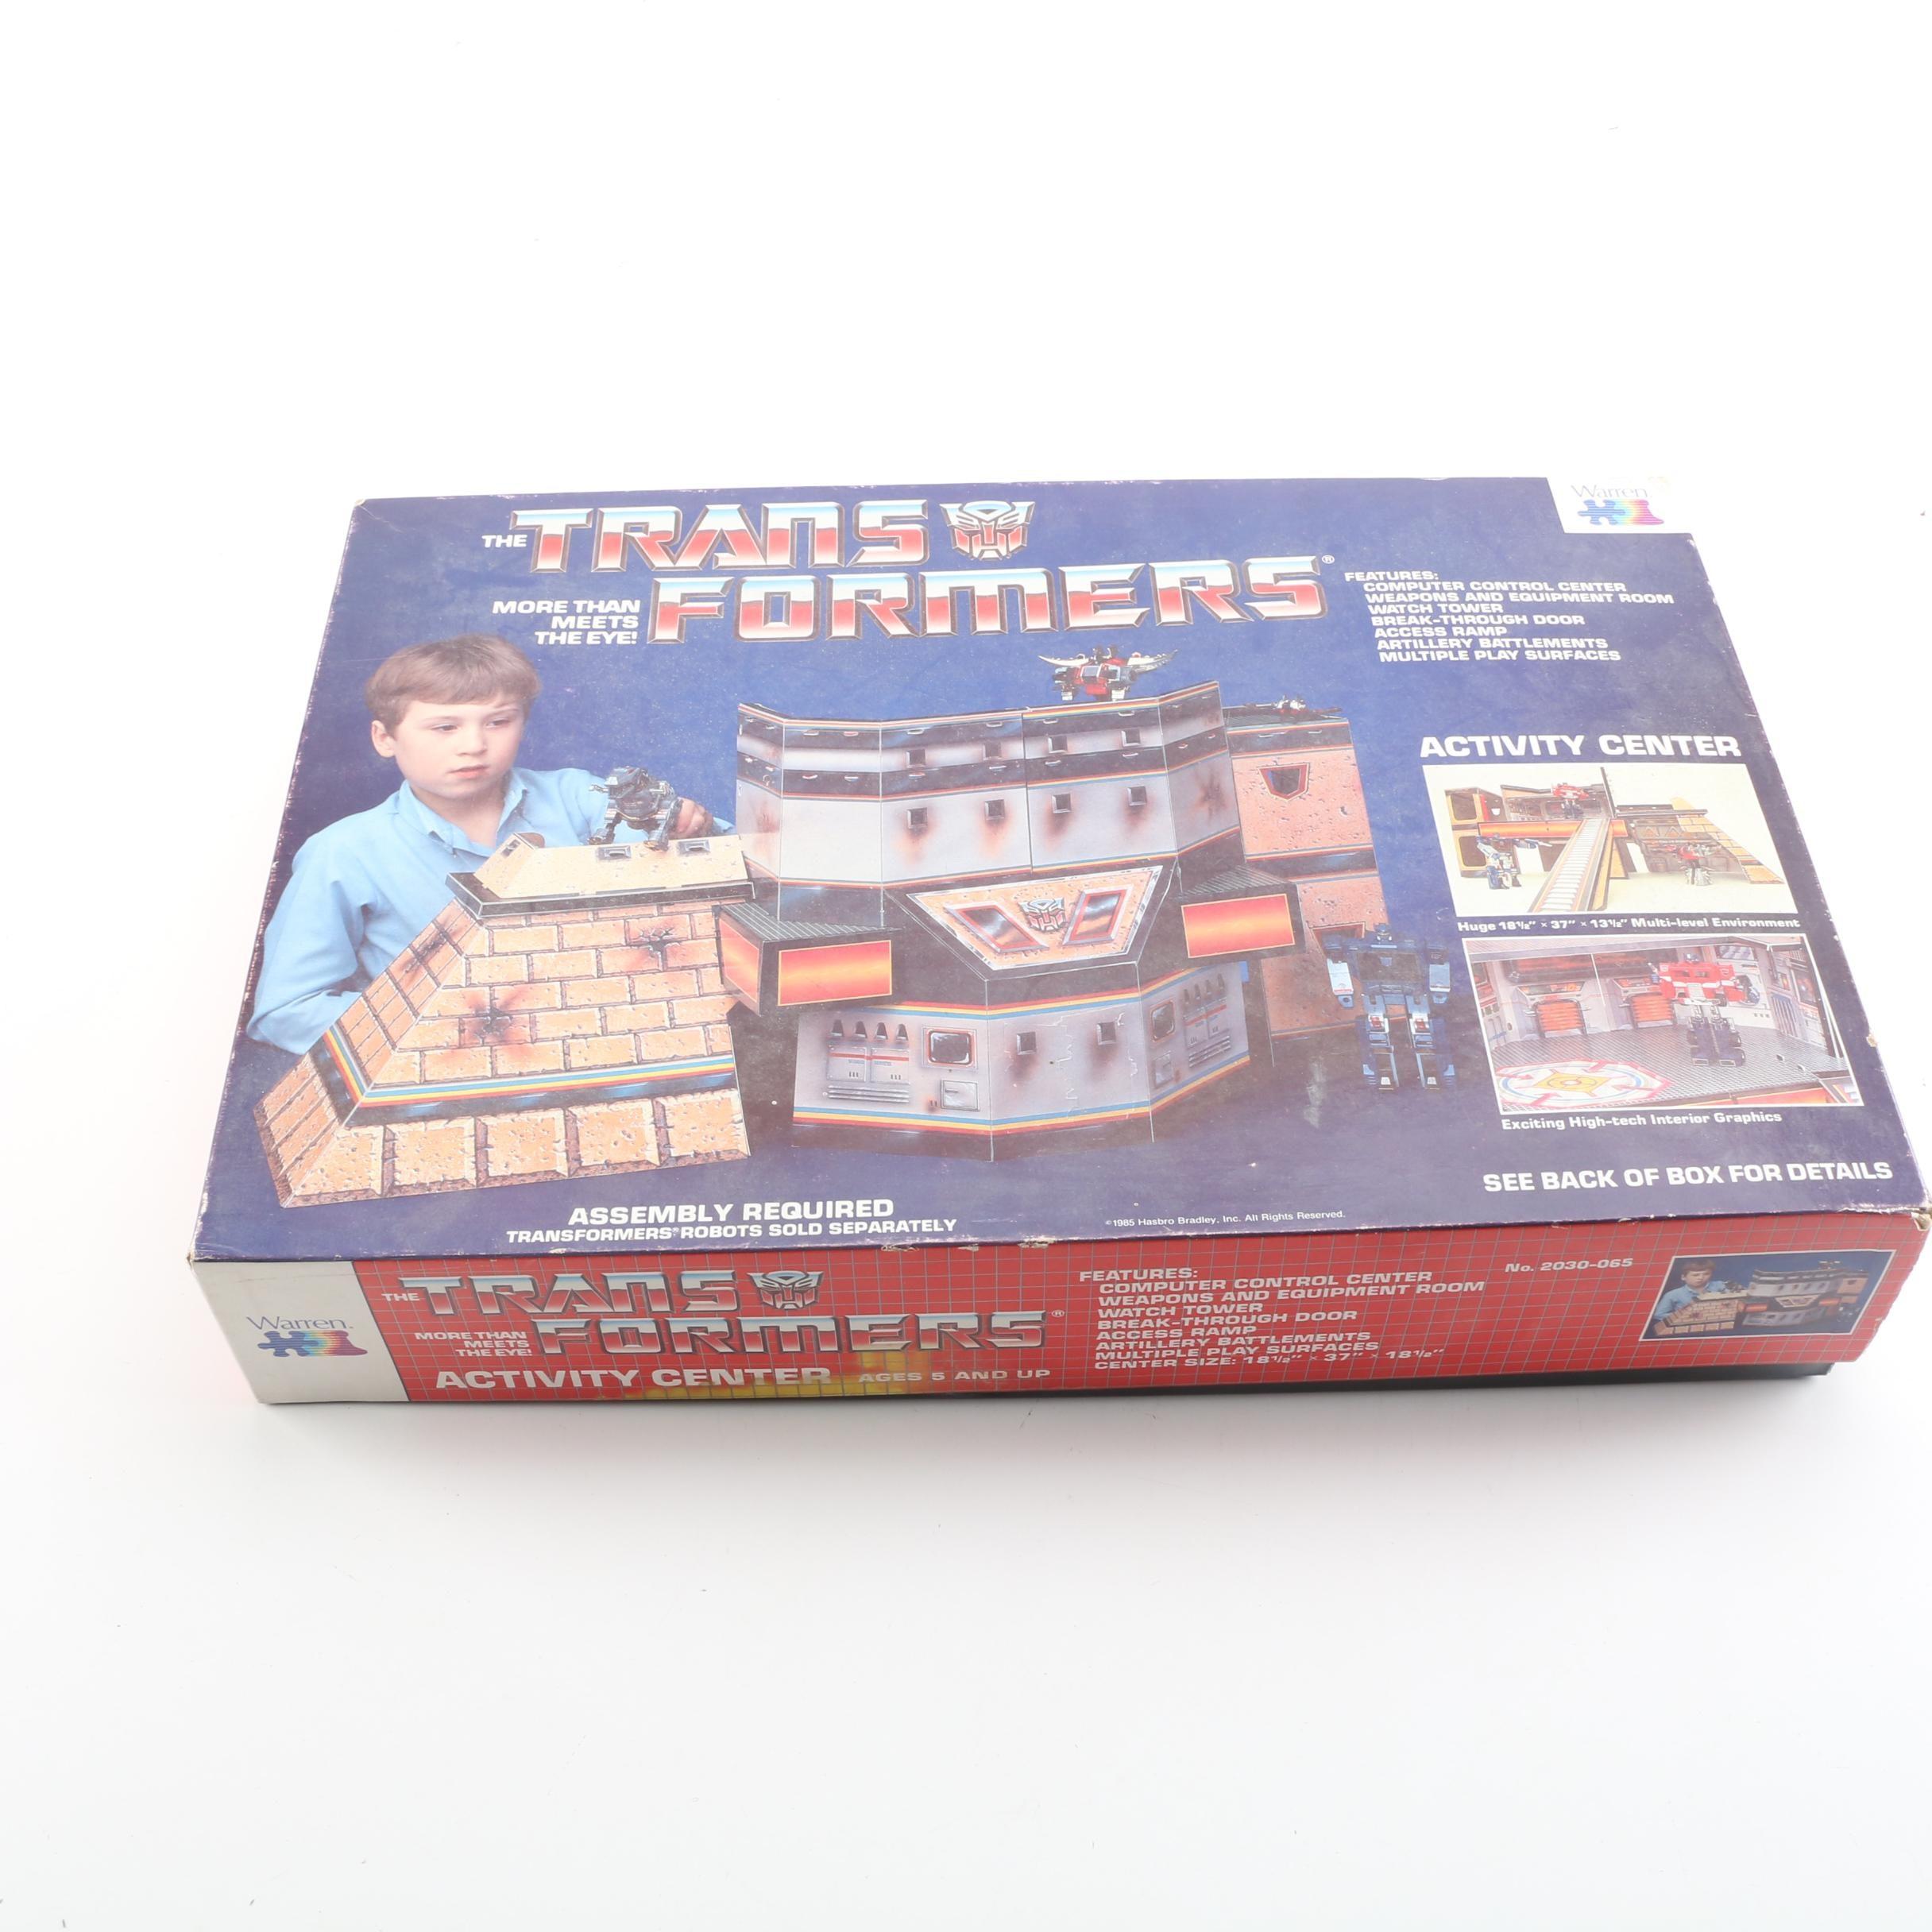 "1985 First Generation ""Transformers"" Activity Center by Warren"